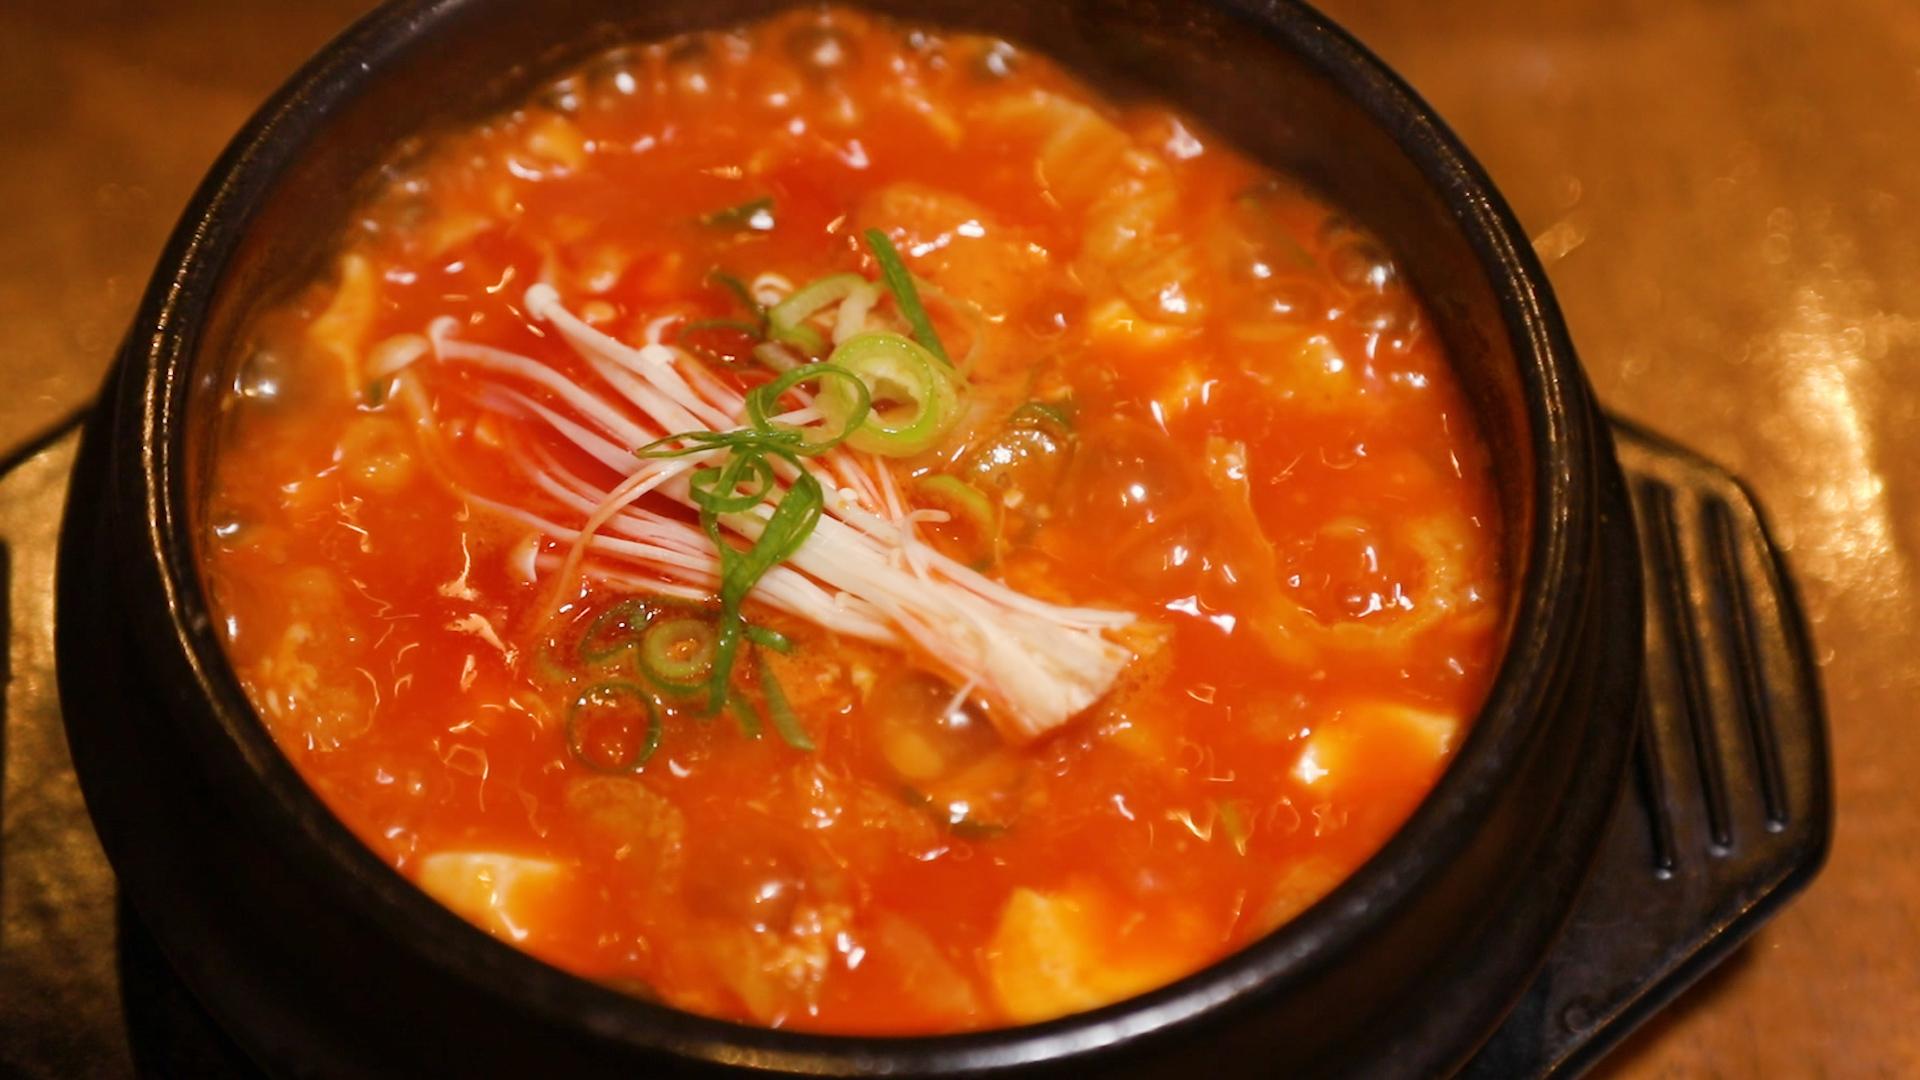 中華料理、韓国料理、紹興酒、マッコリ大好き奥様14 [無断転載禁止]©2ch.netYouTube動画>2本 ->画像>16枚